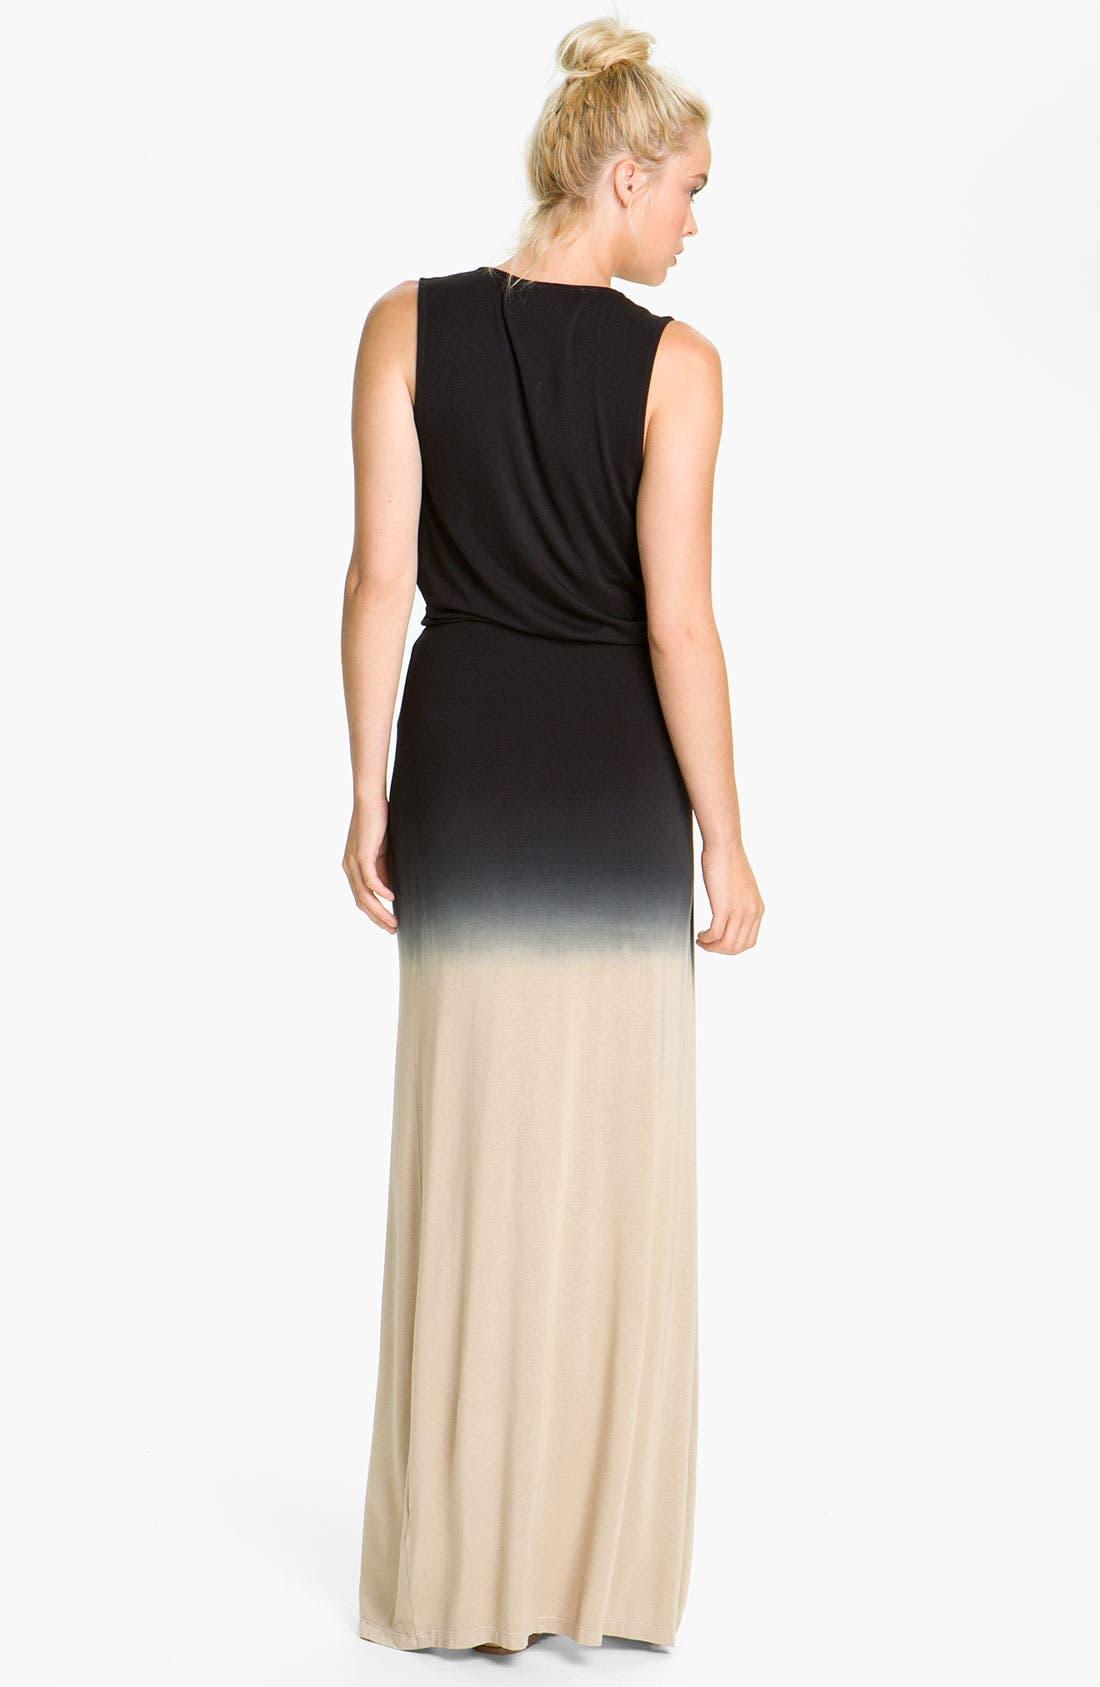 Alternate Image 2  - Young, Fabulous & Broke 'Arroyo' Ombré Maxi Dress